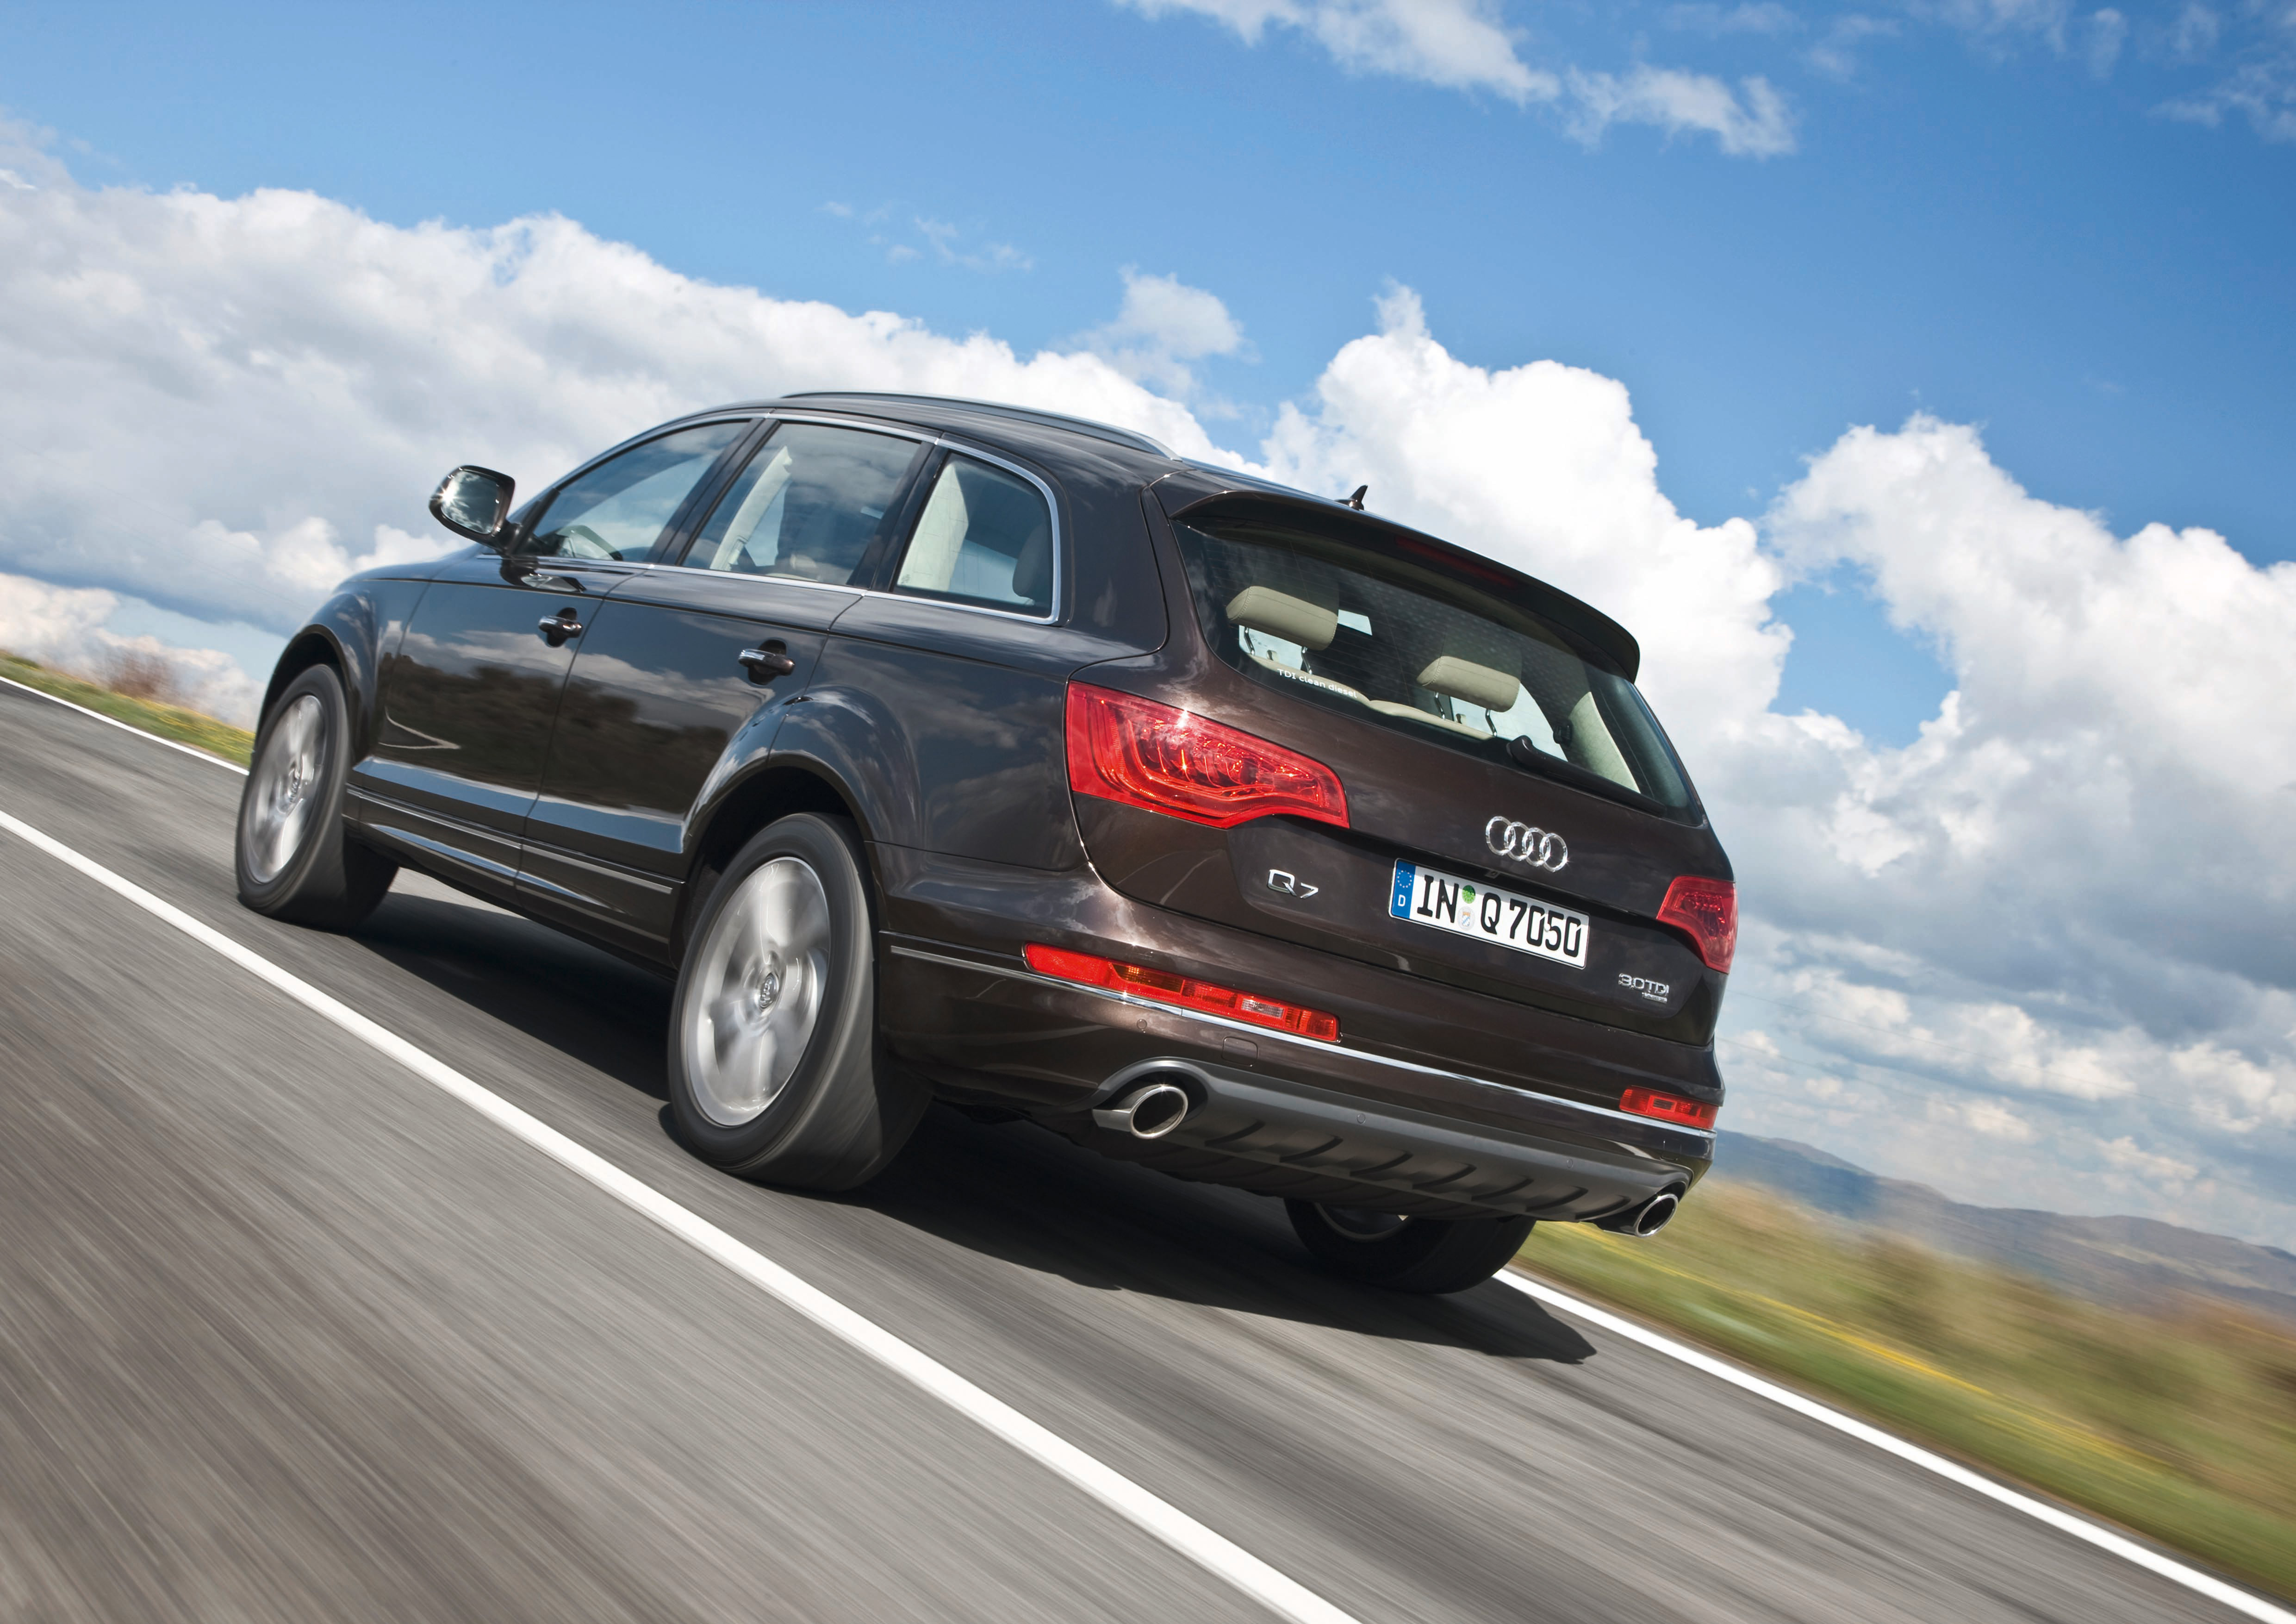 Audi Q7 3.0 TDI clean diesel quattro/Fahraufnahme